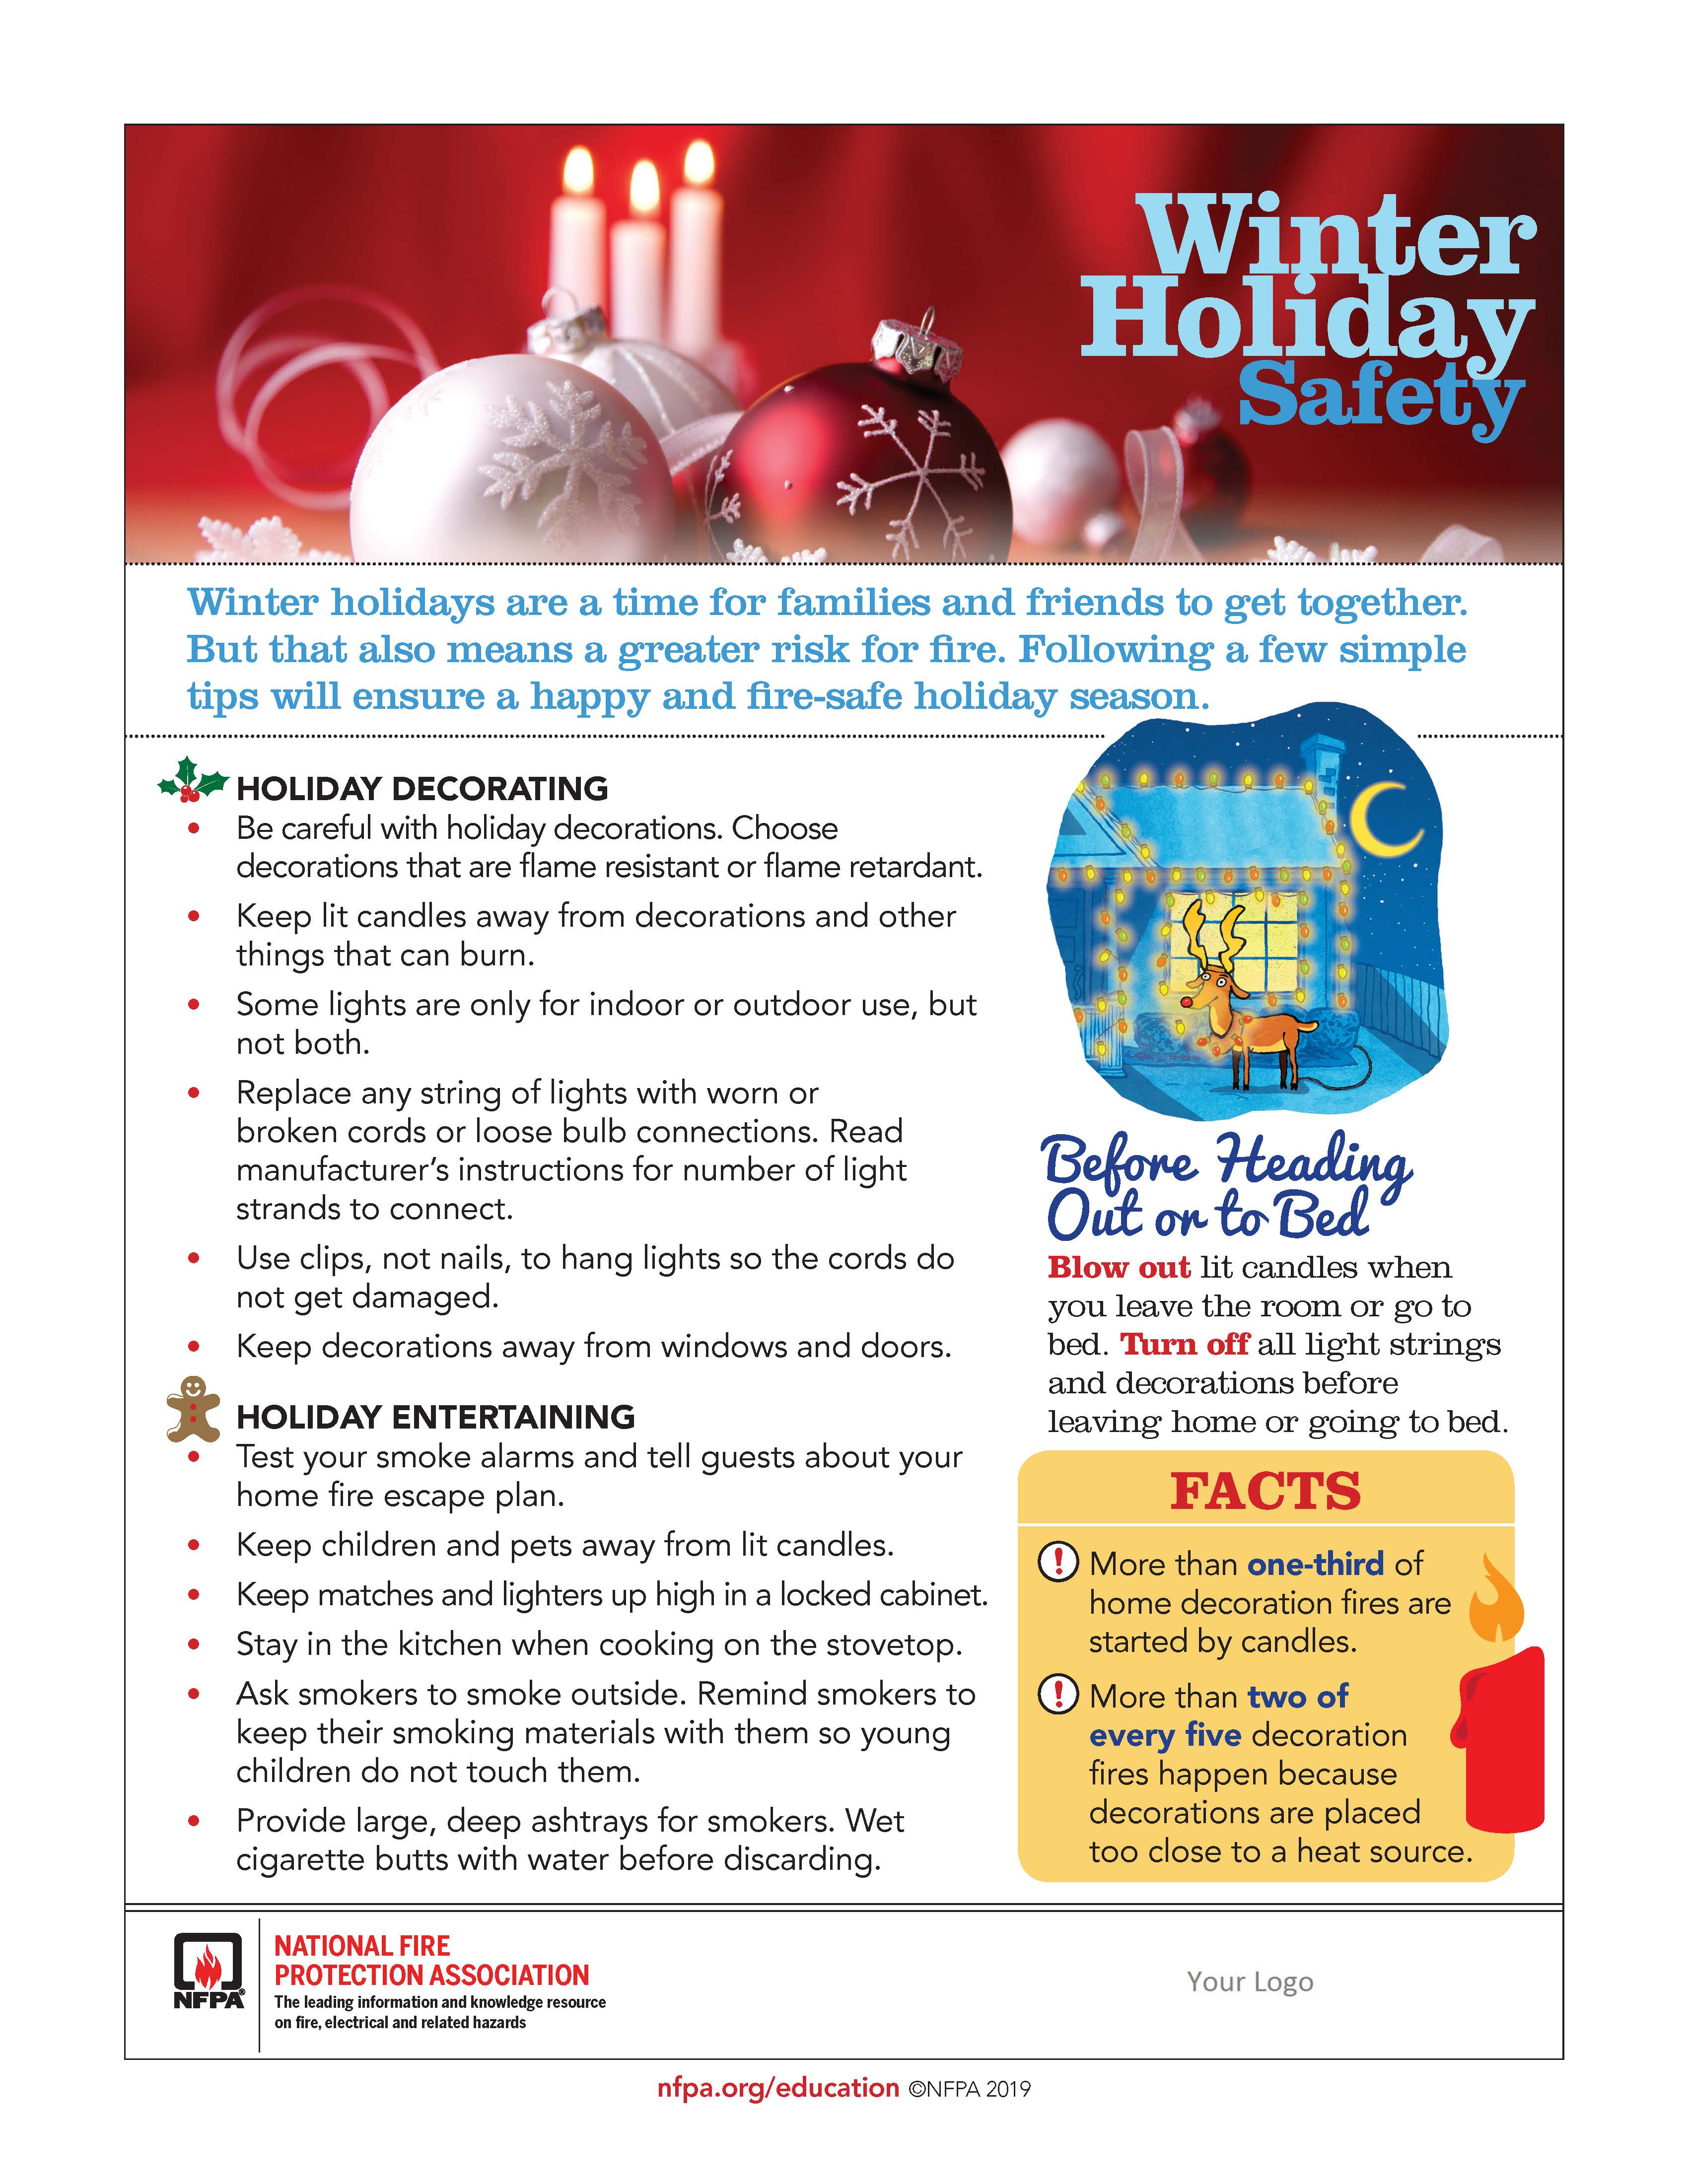 Ameri-Tech Emergency Management Christmas Tree Safety